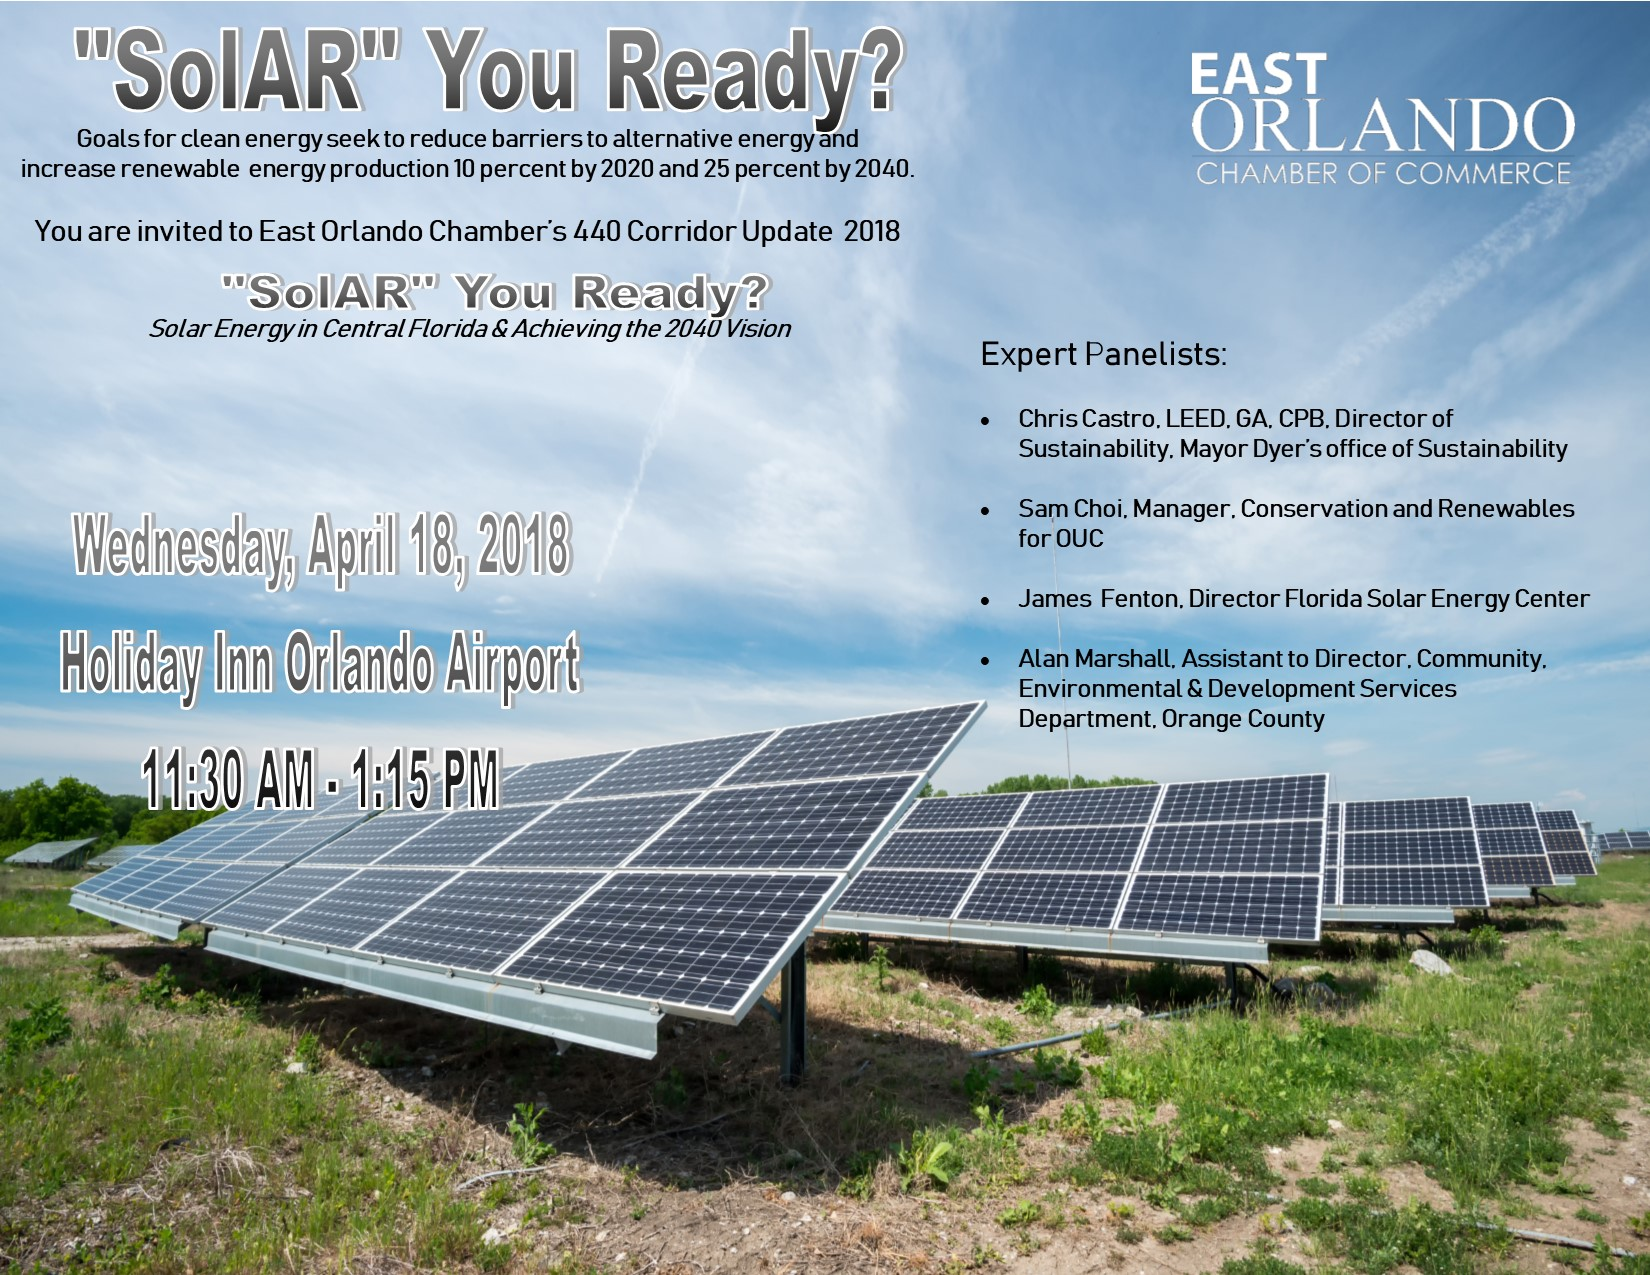 a description of the presentation on solar energy